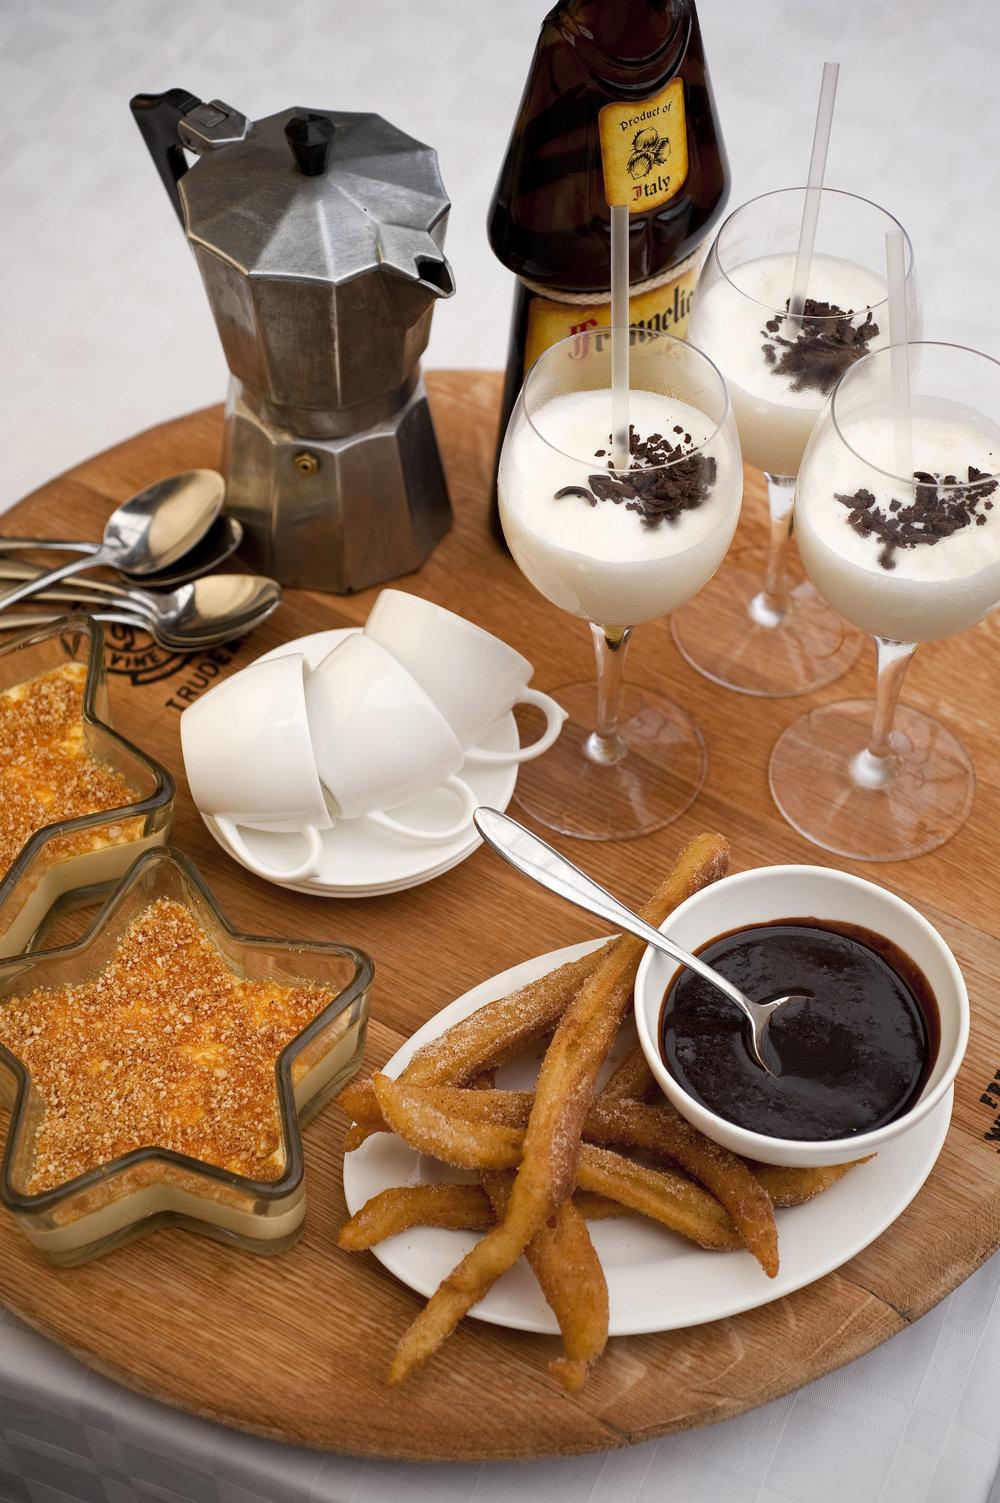 Food - Dessert platter.jpg